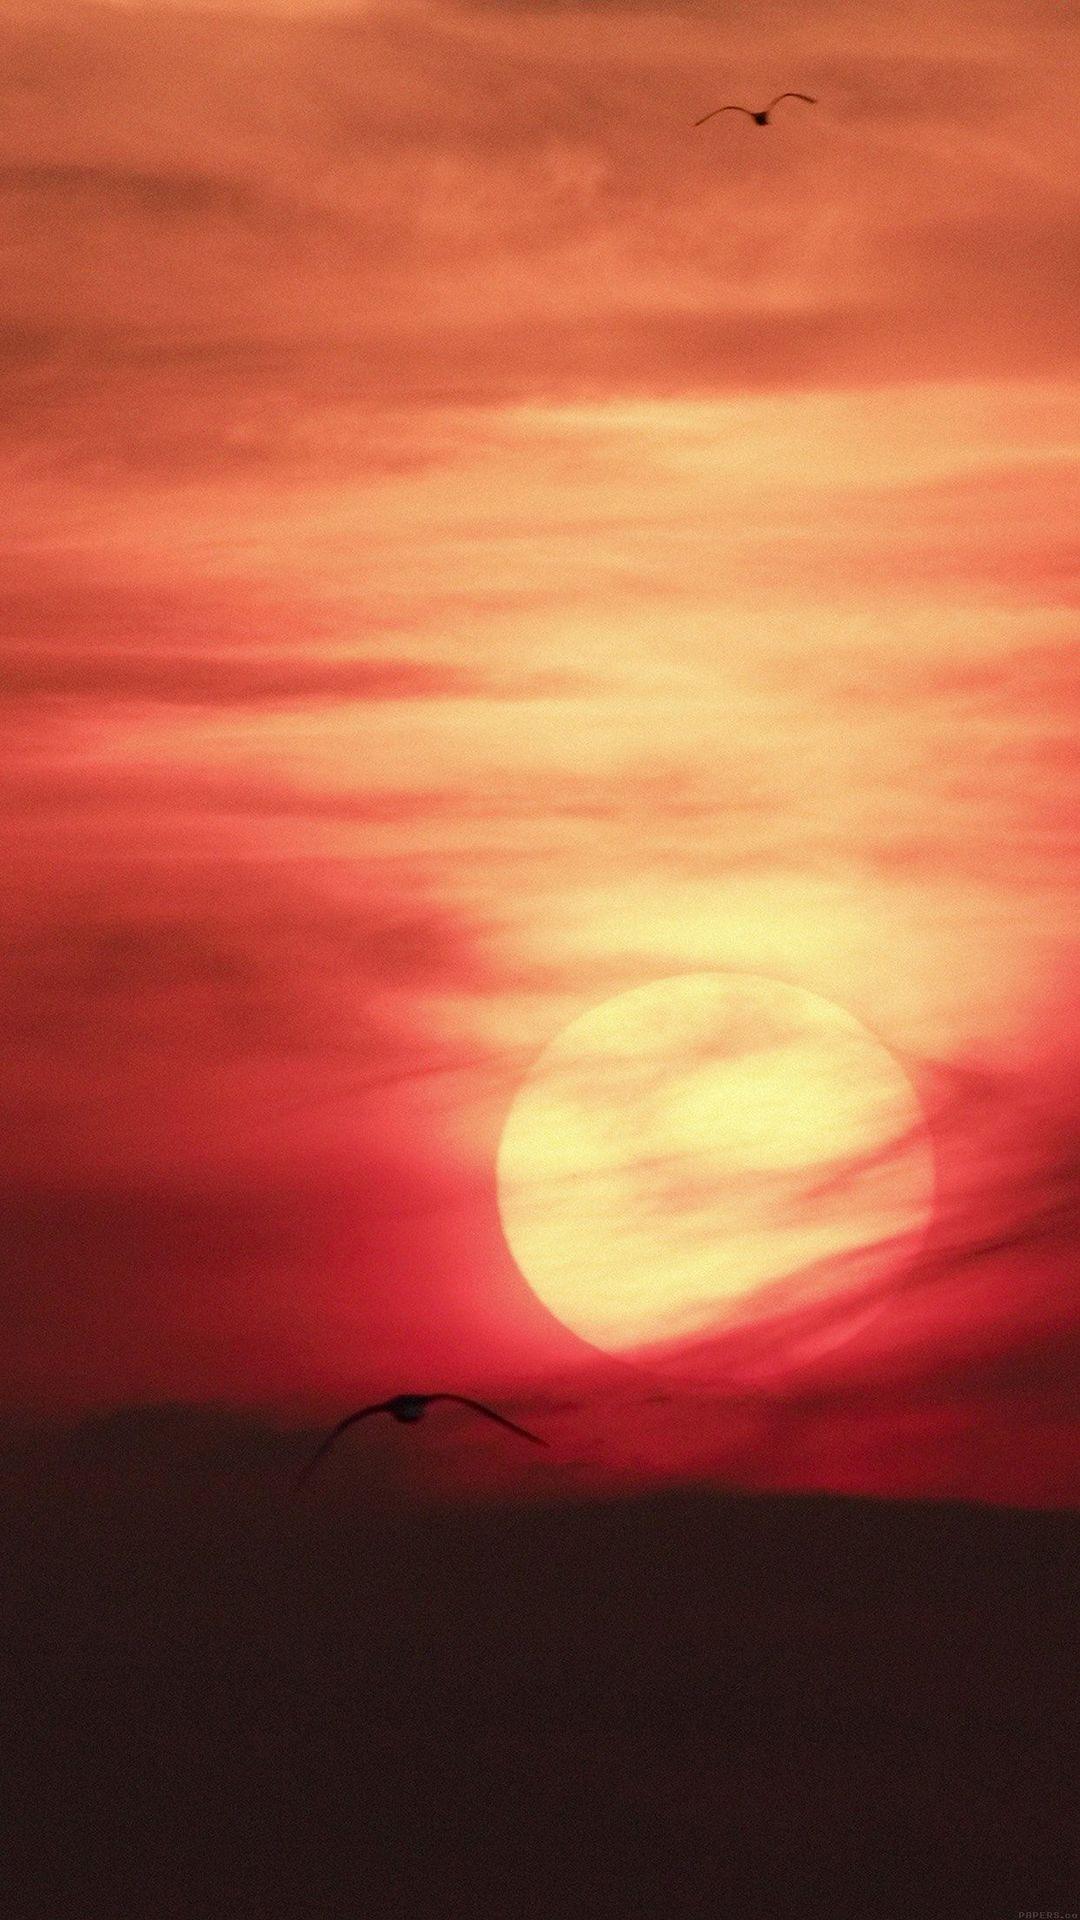 Artistic Red Sunset Desert IPhone 6 Plus Wallpaper